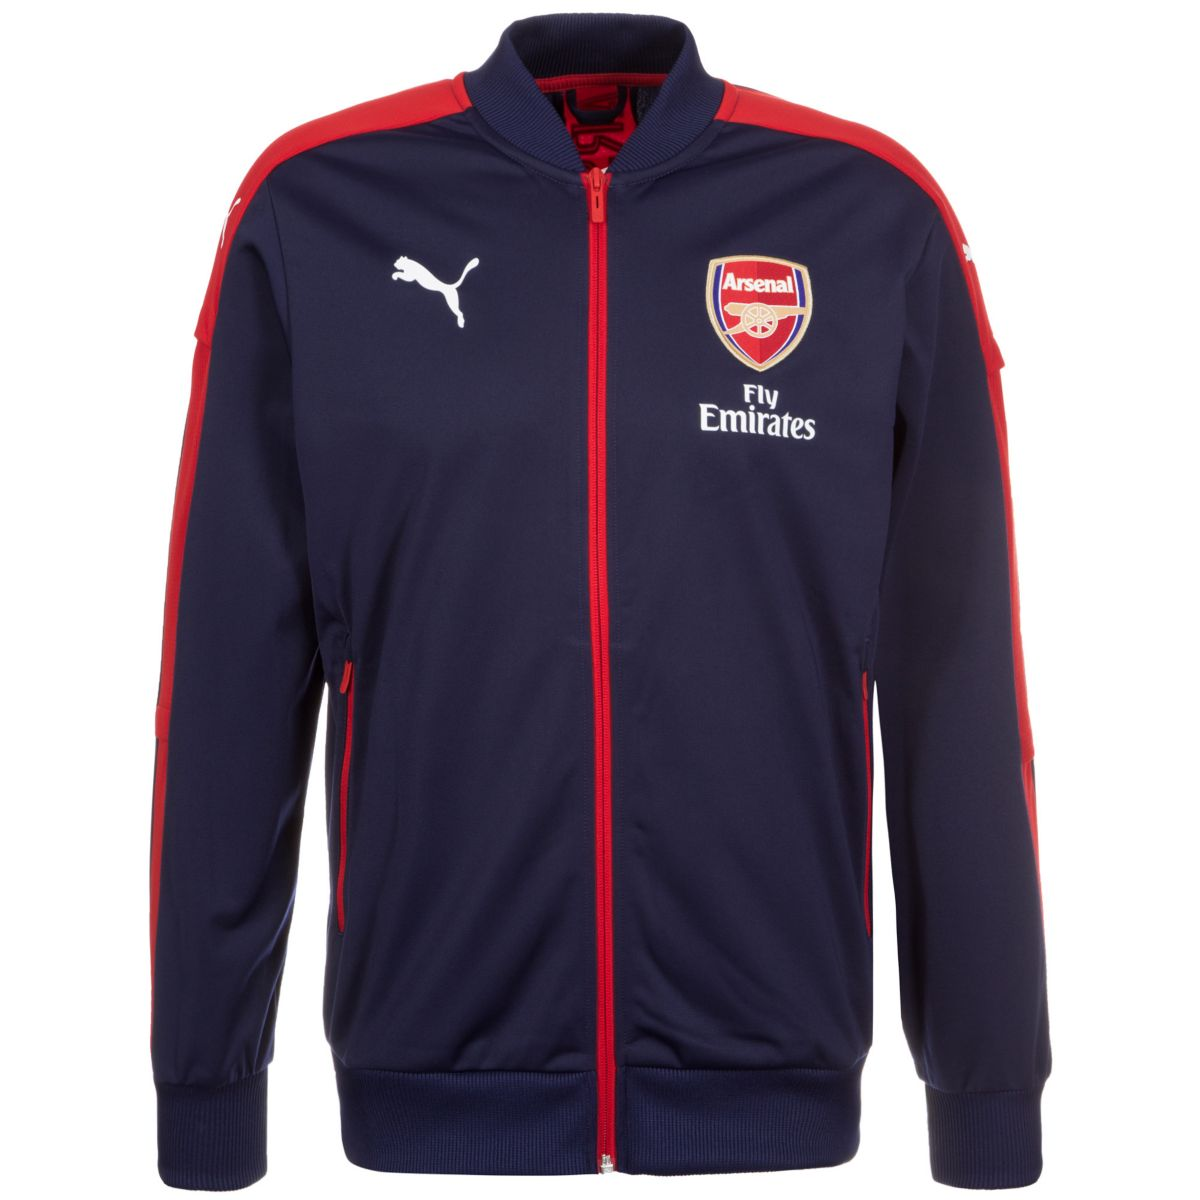 PUMA FC Arsenal Stadium Trainingsjacke Herren